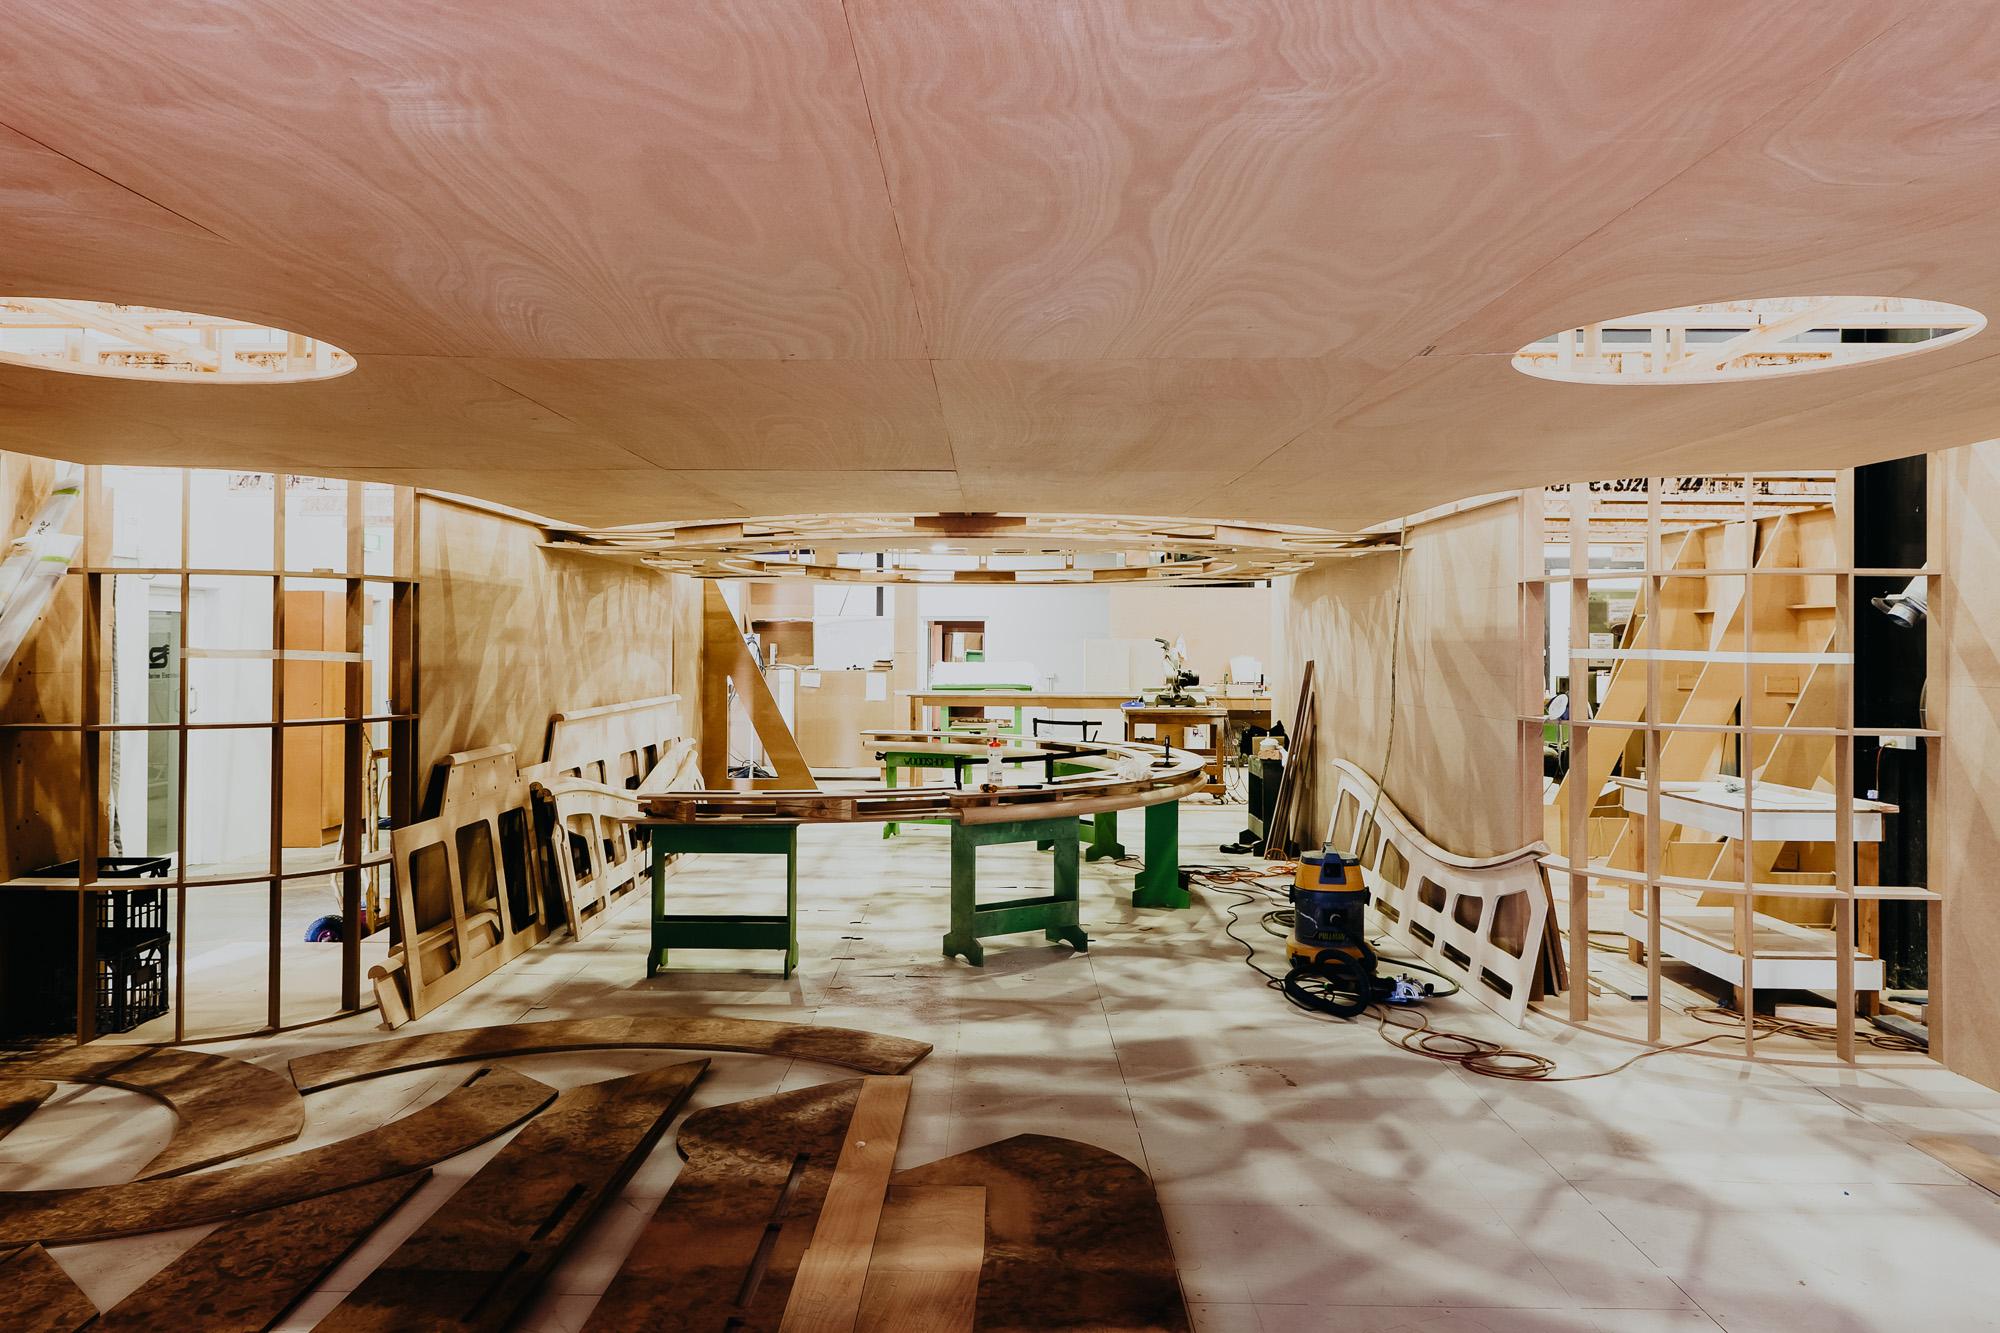 Luxury Superyacht construction in the workshop